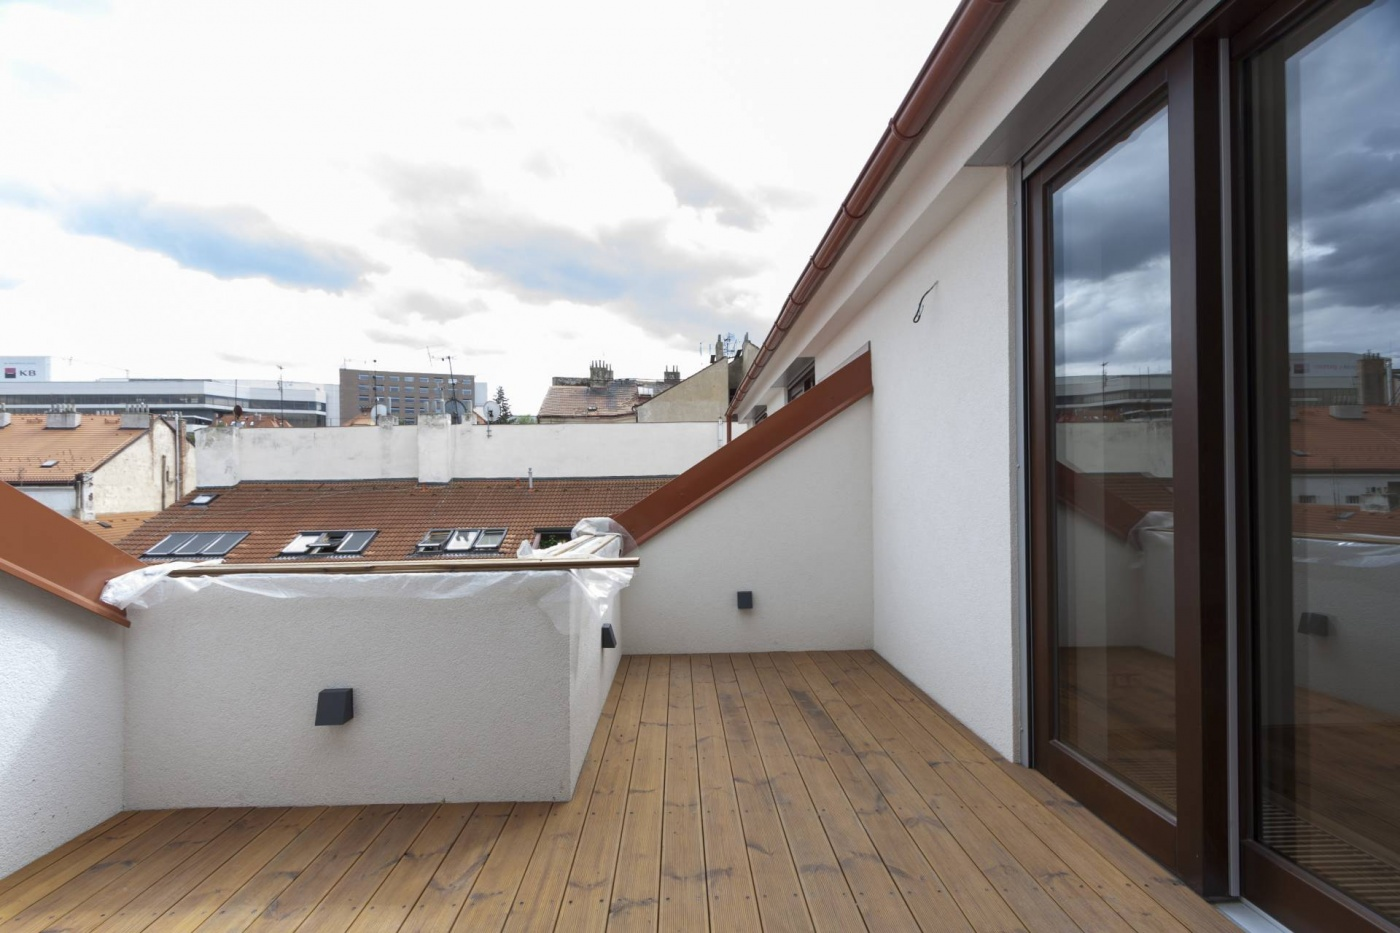 Půdní byt 3+kk, plocha 109 m², ulice Lumírova, Praha 2 - Vyšehrad, cena 8 950 000 Kč | 17